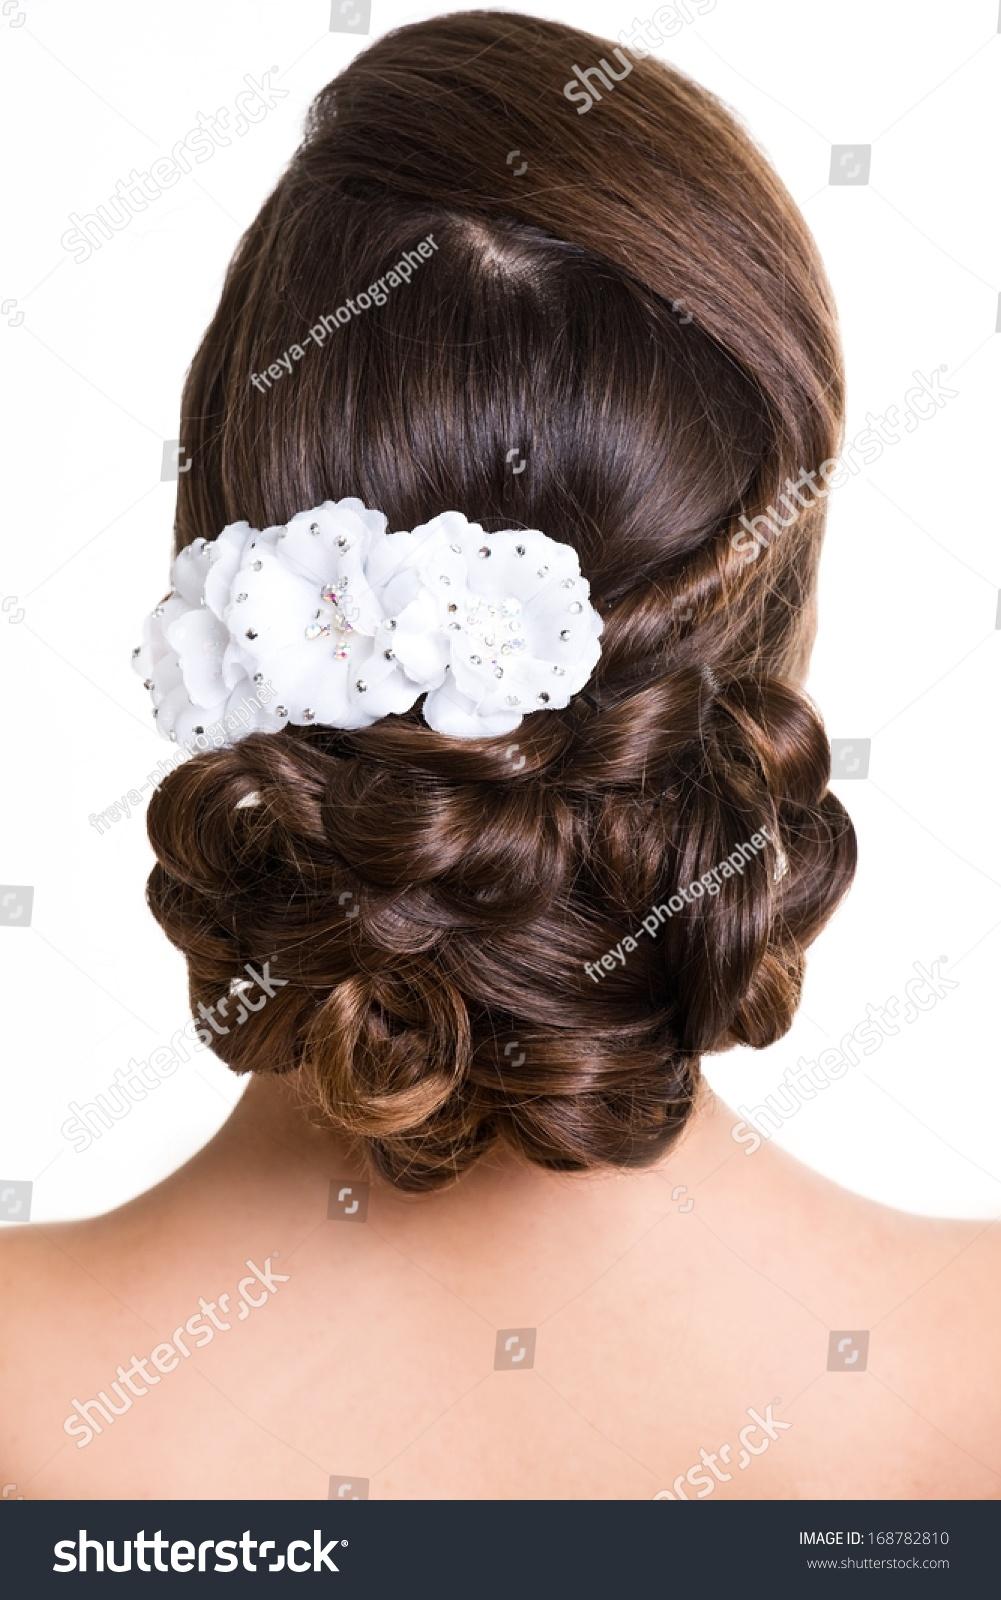 Photos Shutterstock Beautiful Bride Photos 119